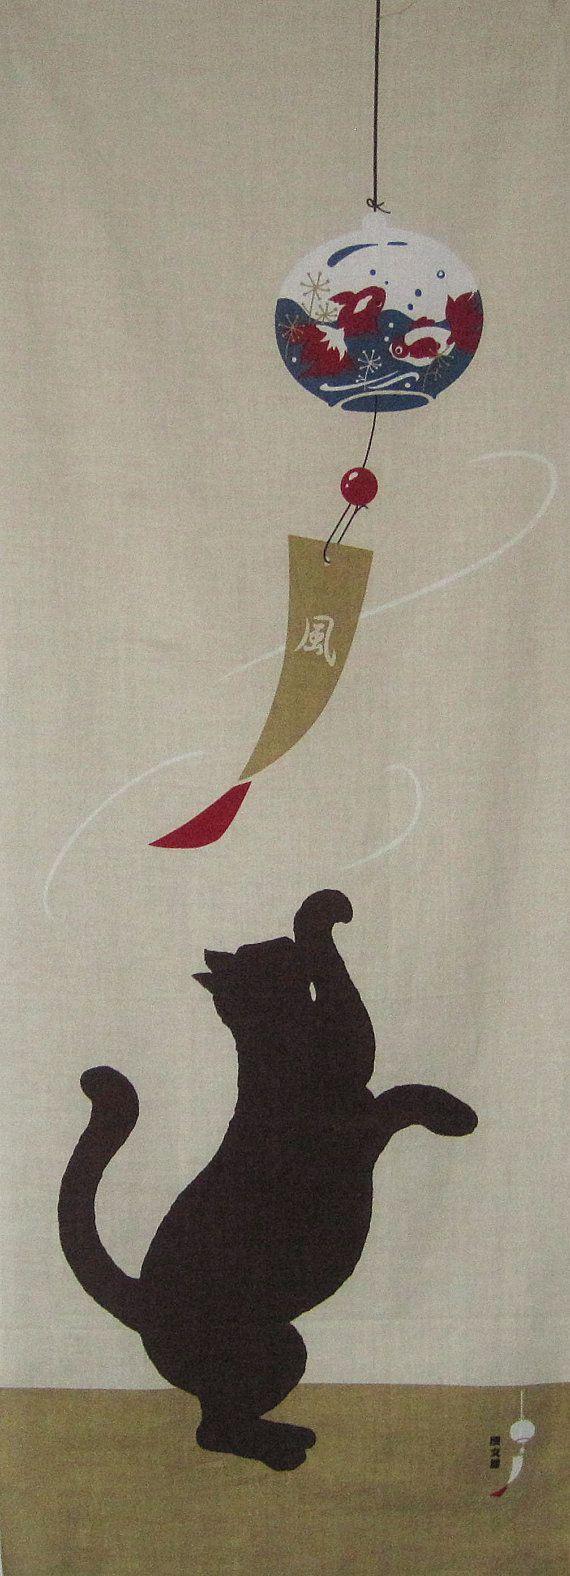 """Tenugui (手拭い)"